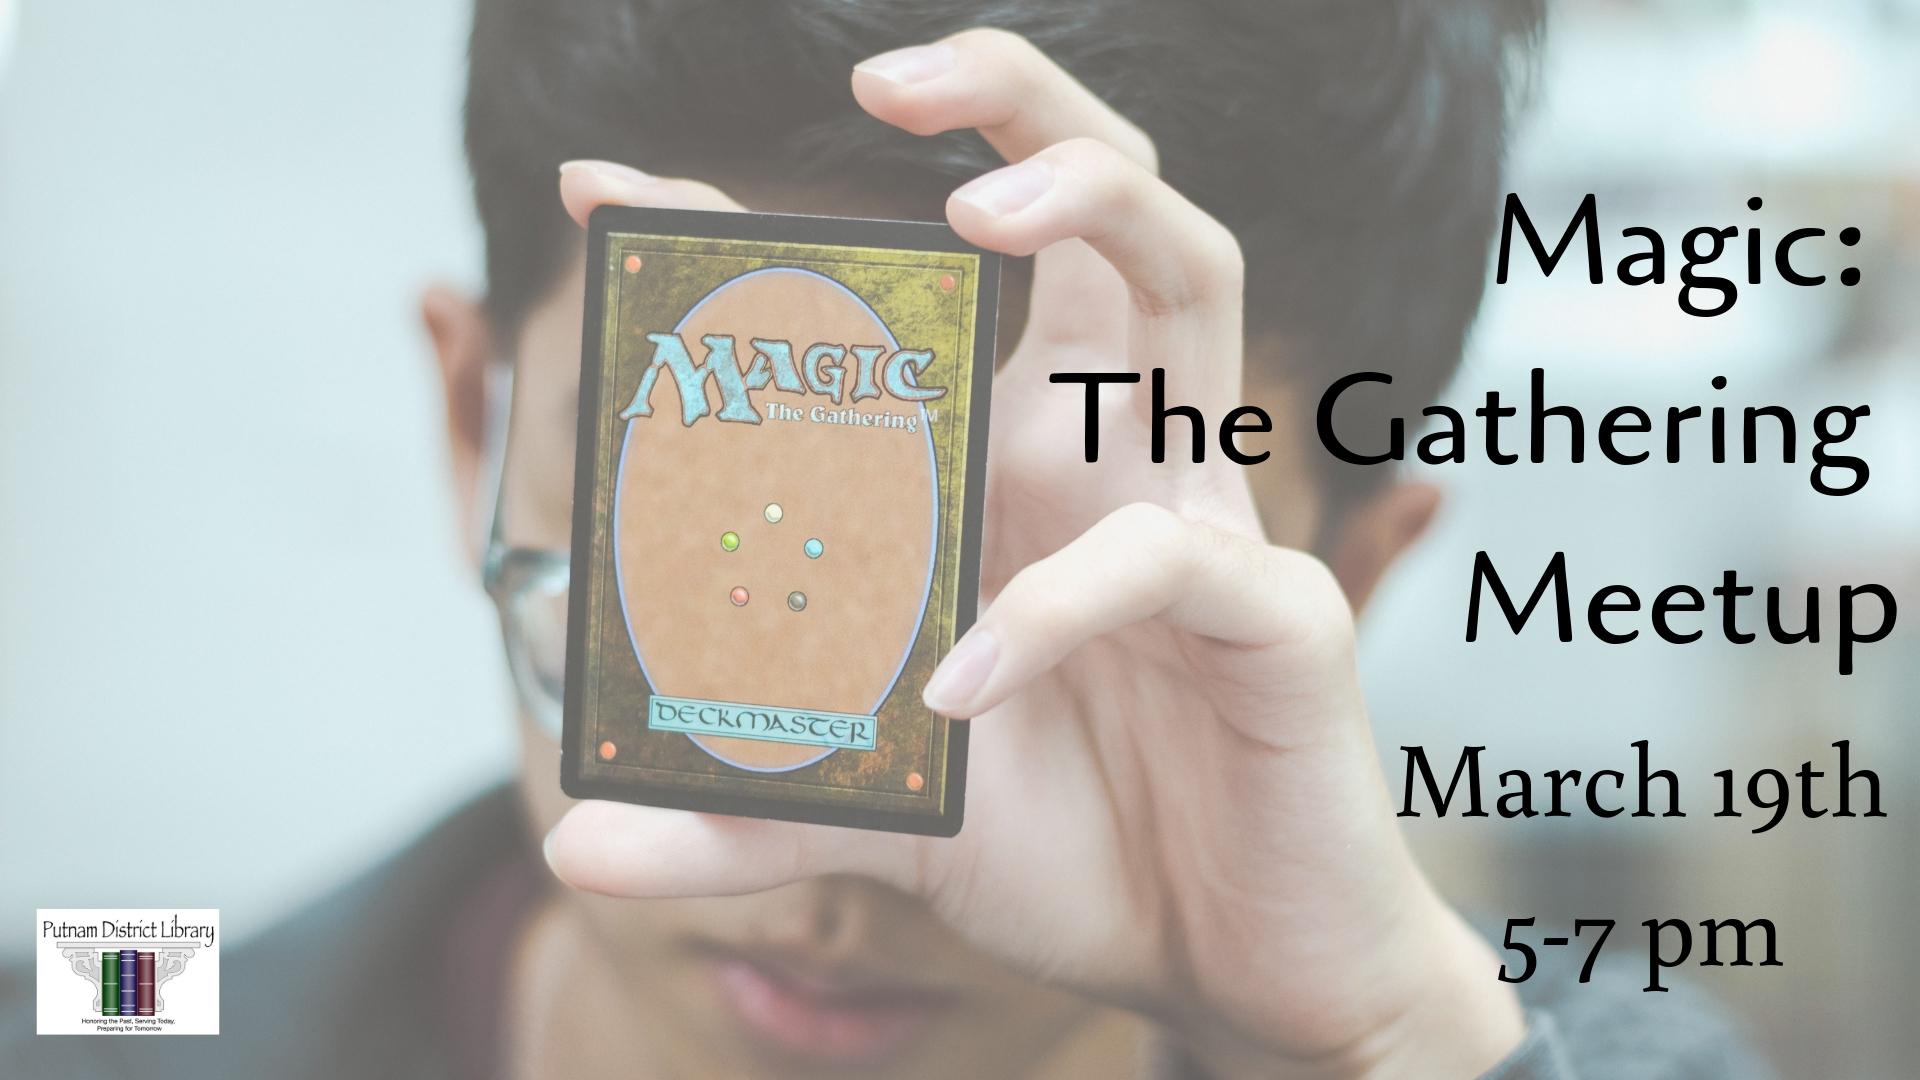 Magic the Gathering Meetup